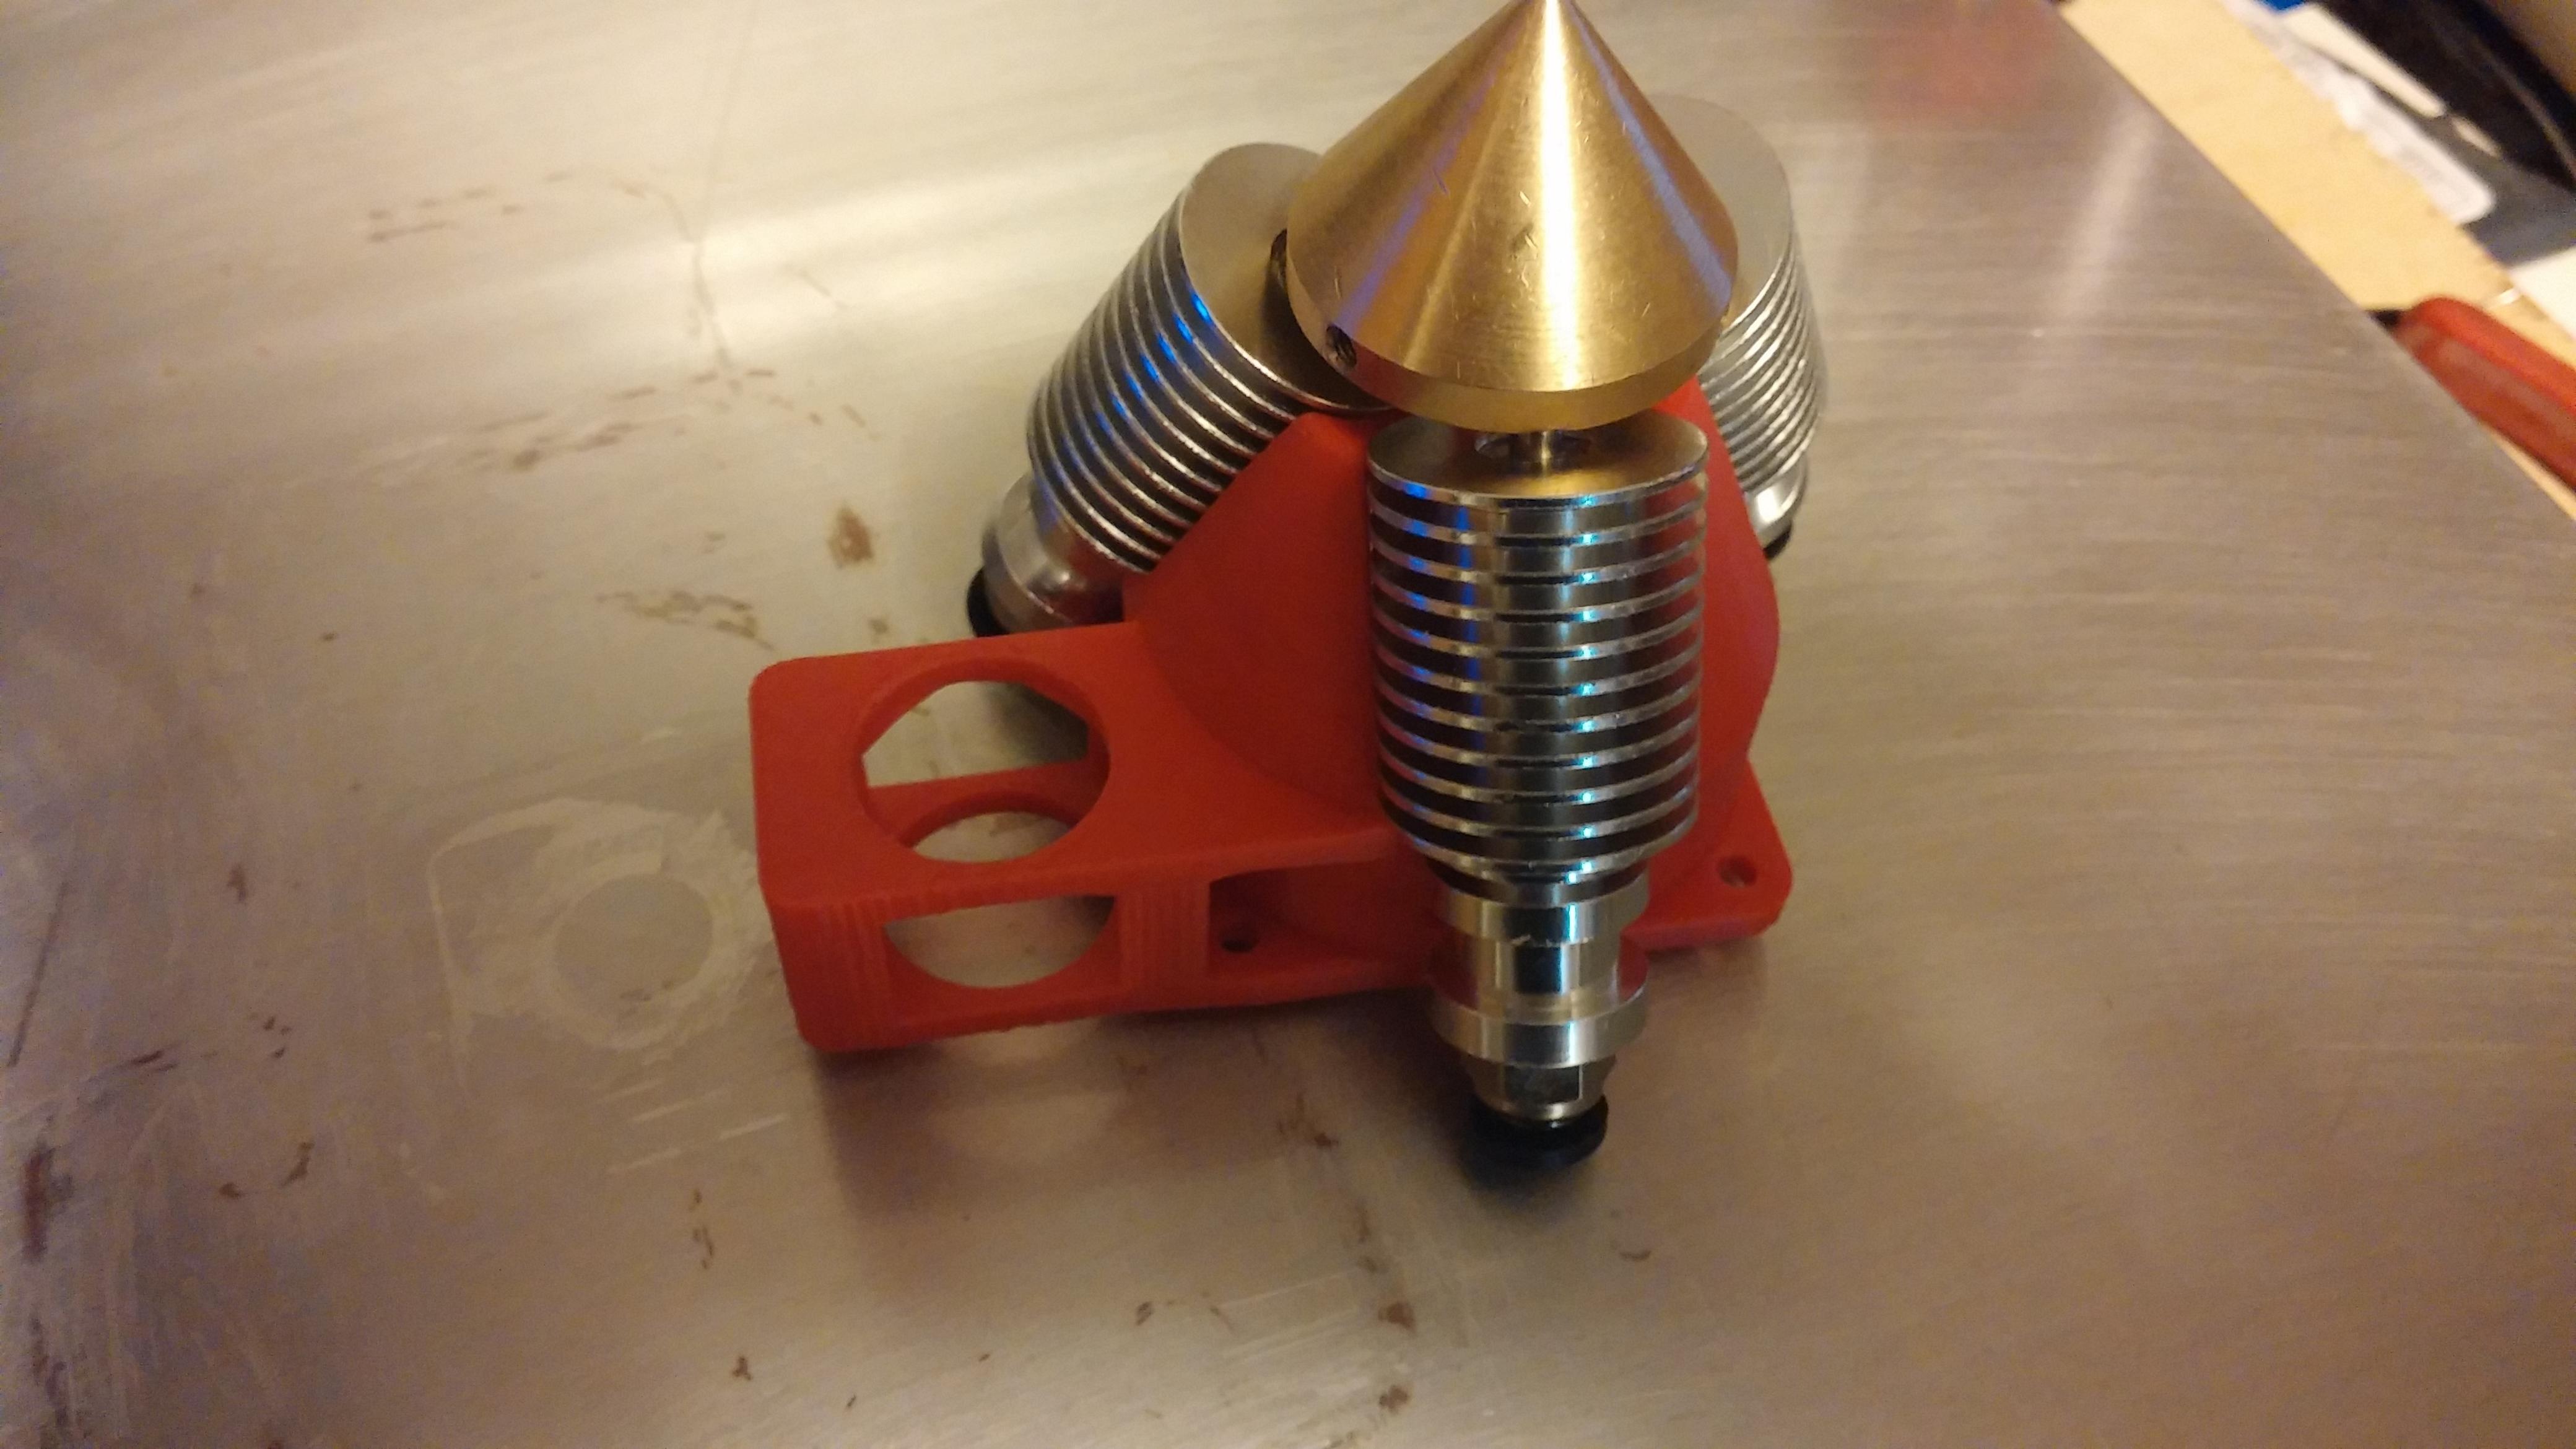 1110151854a.jpg Download free STL file NCS P3-v Steel Reducing bushing adapter • 3D printing object, trentjw